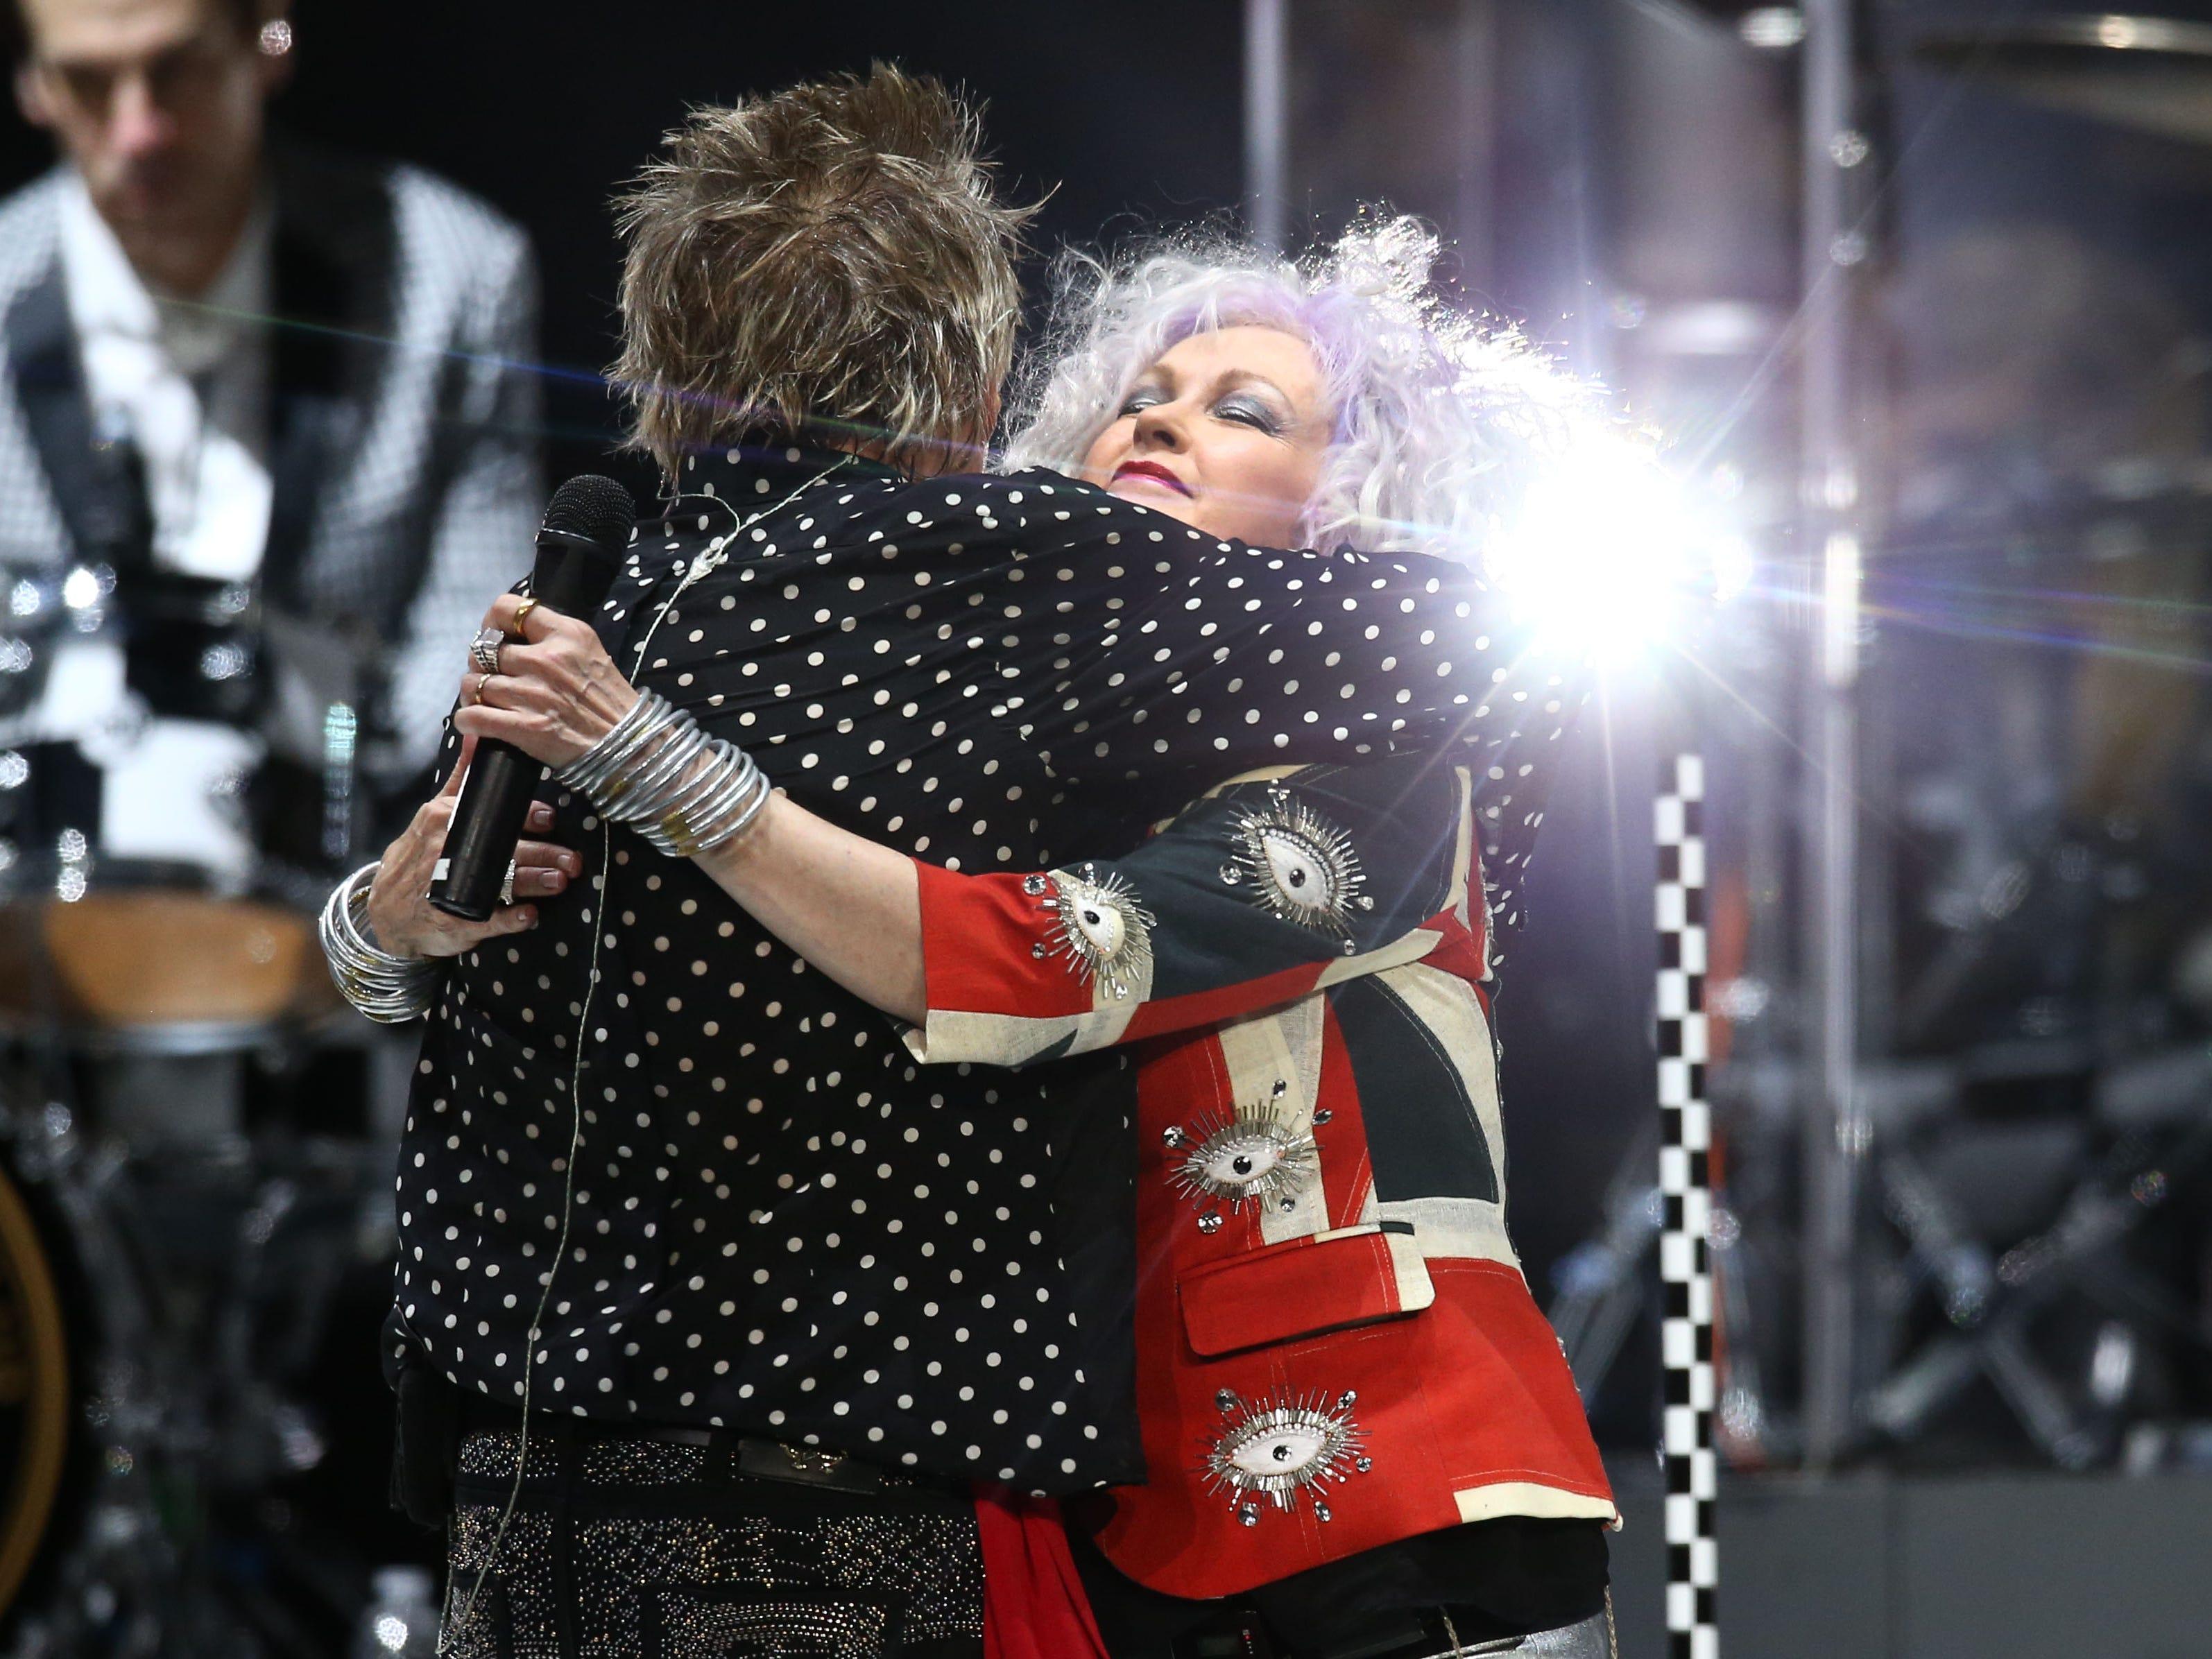 Rod Stewart and Cyndi Lauper perform on Aug. 24, 2018, at Talking Stick Resort Arena in Phoenix, Ariz.